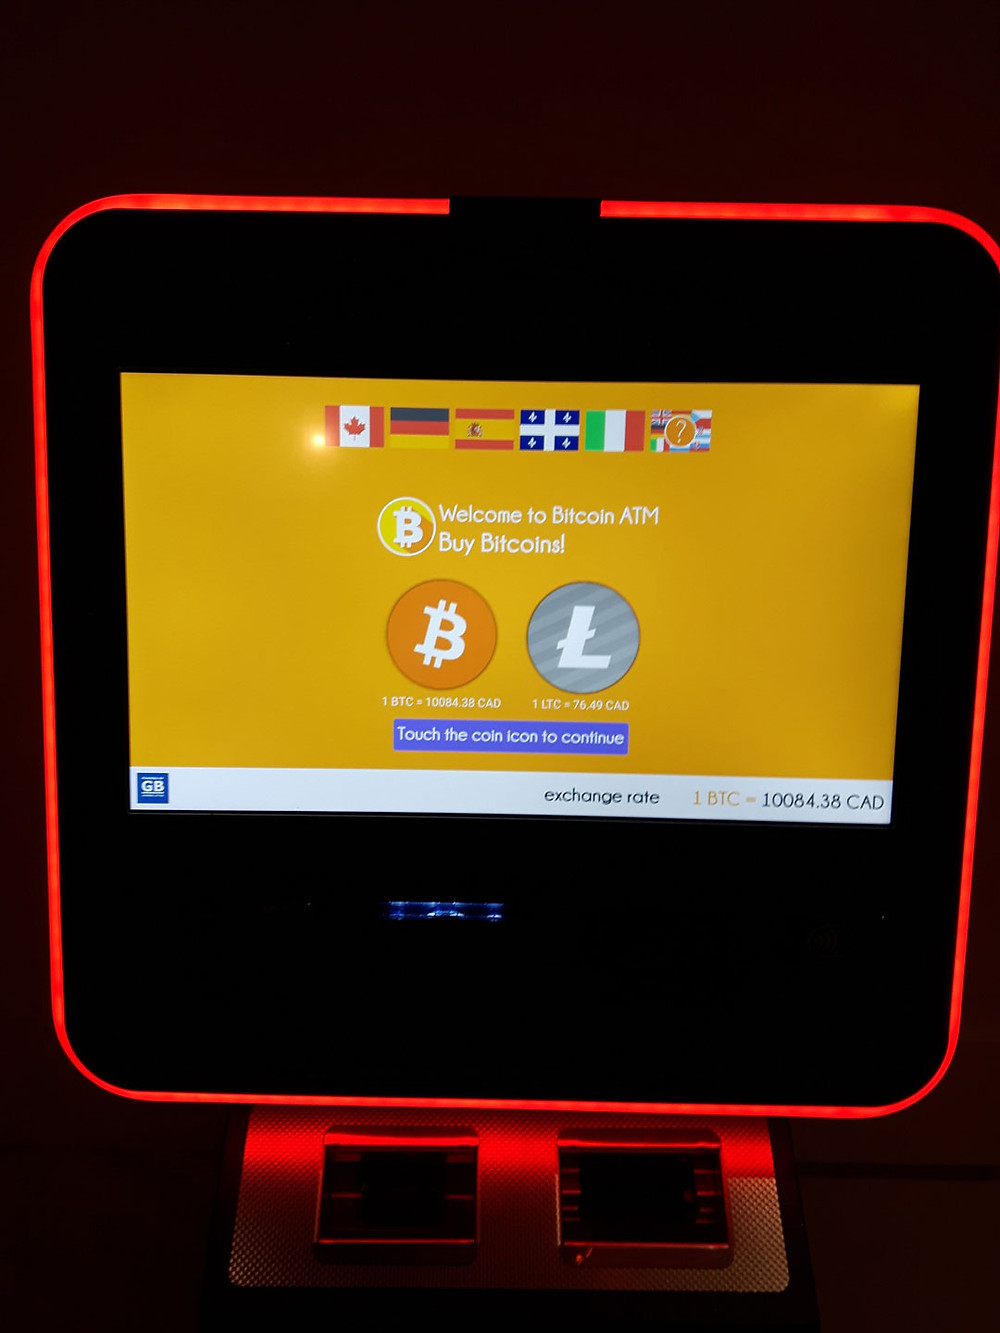 Bitcoin ATM in Whistler, BC